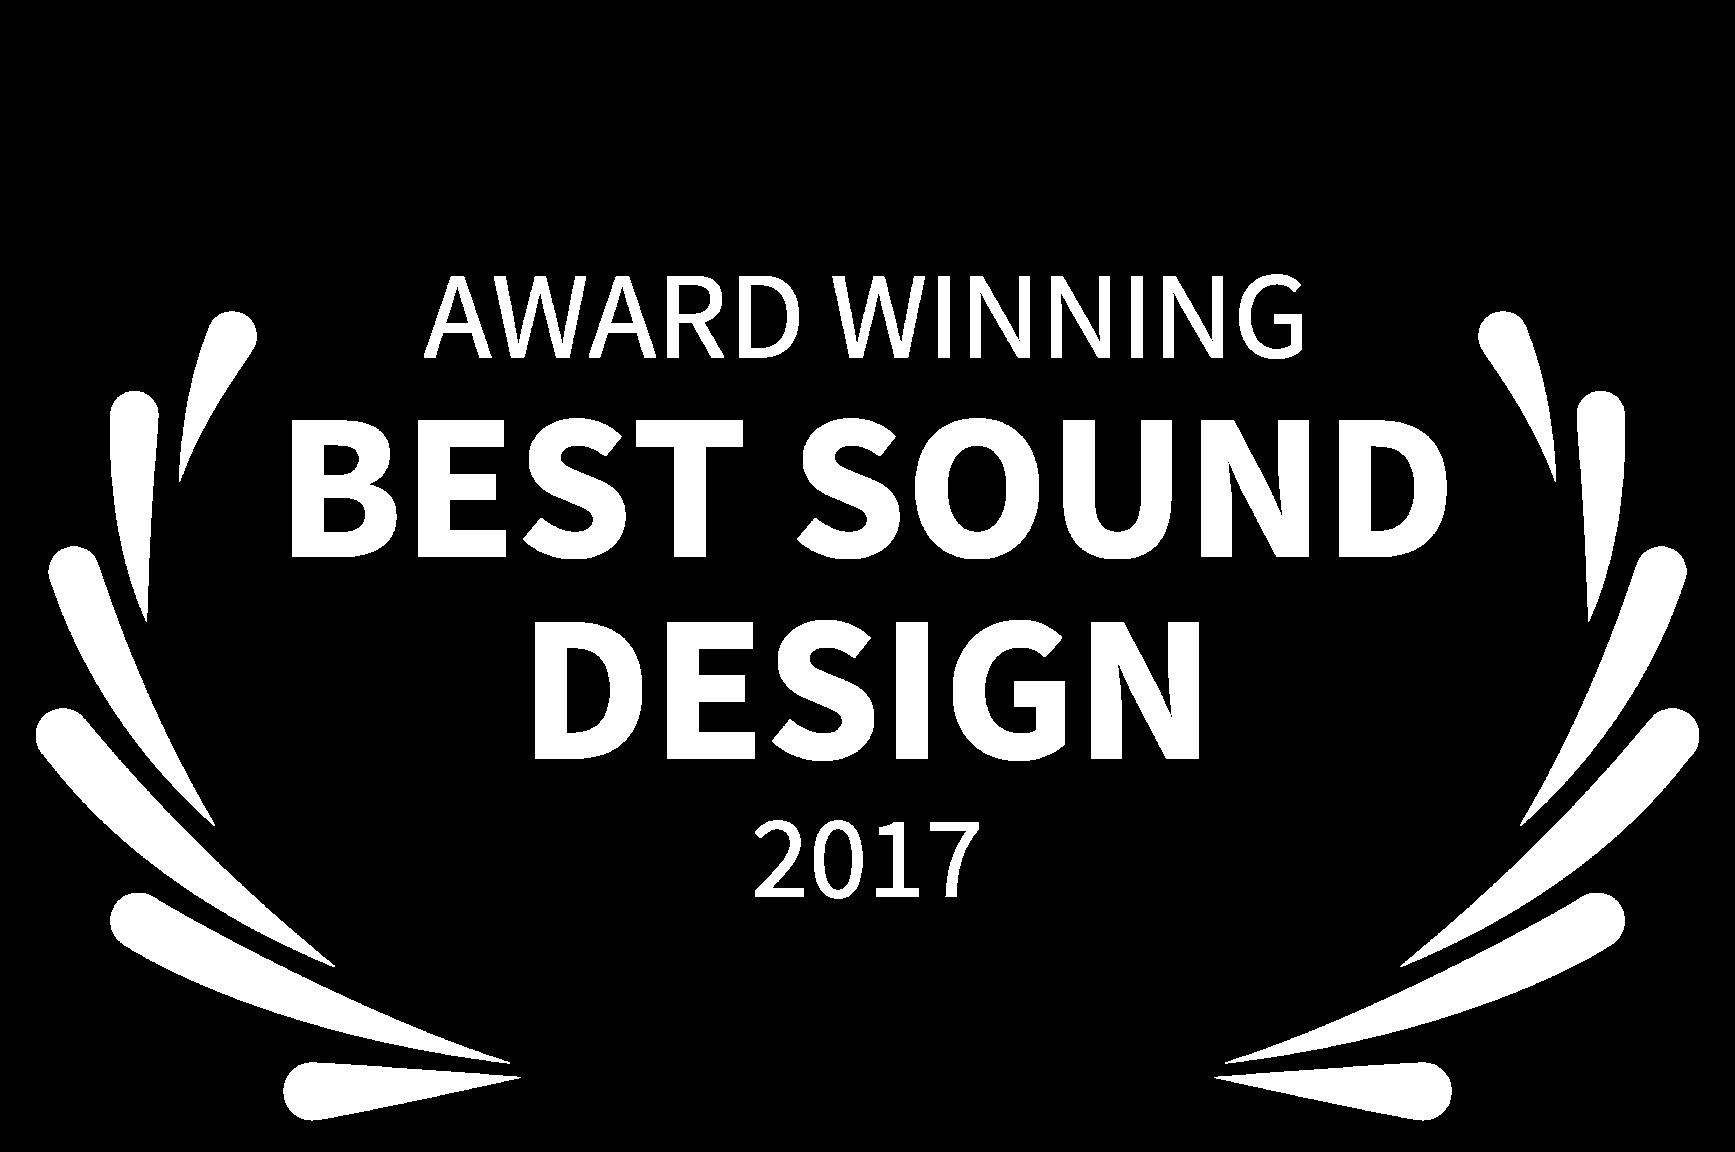 AWARD WINNING - BEST SOUND DESIGN - 2017-2.png